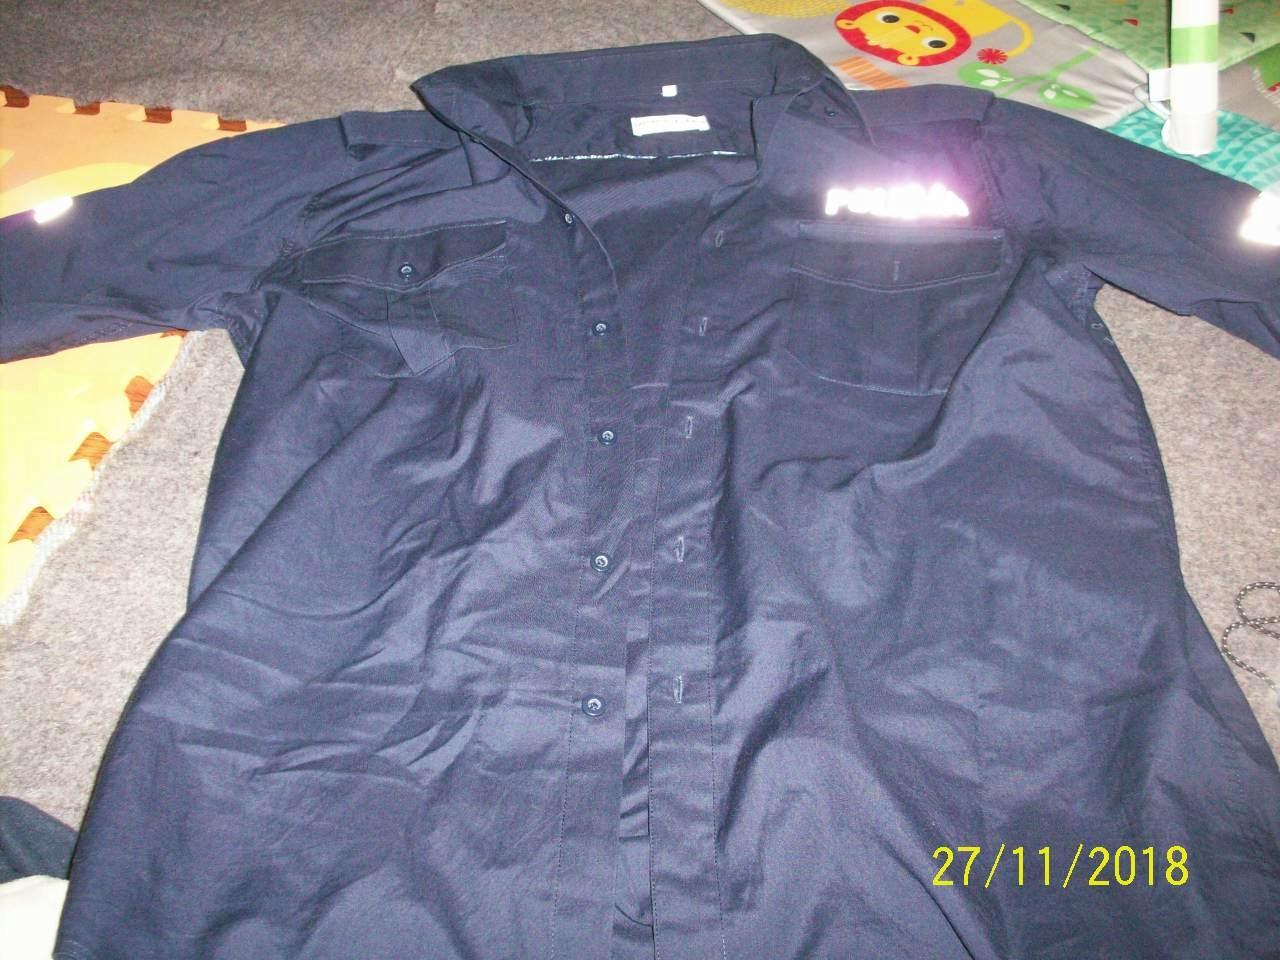 Koszula policja krótki rekaw arlen